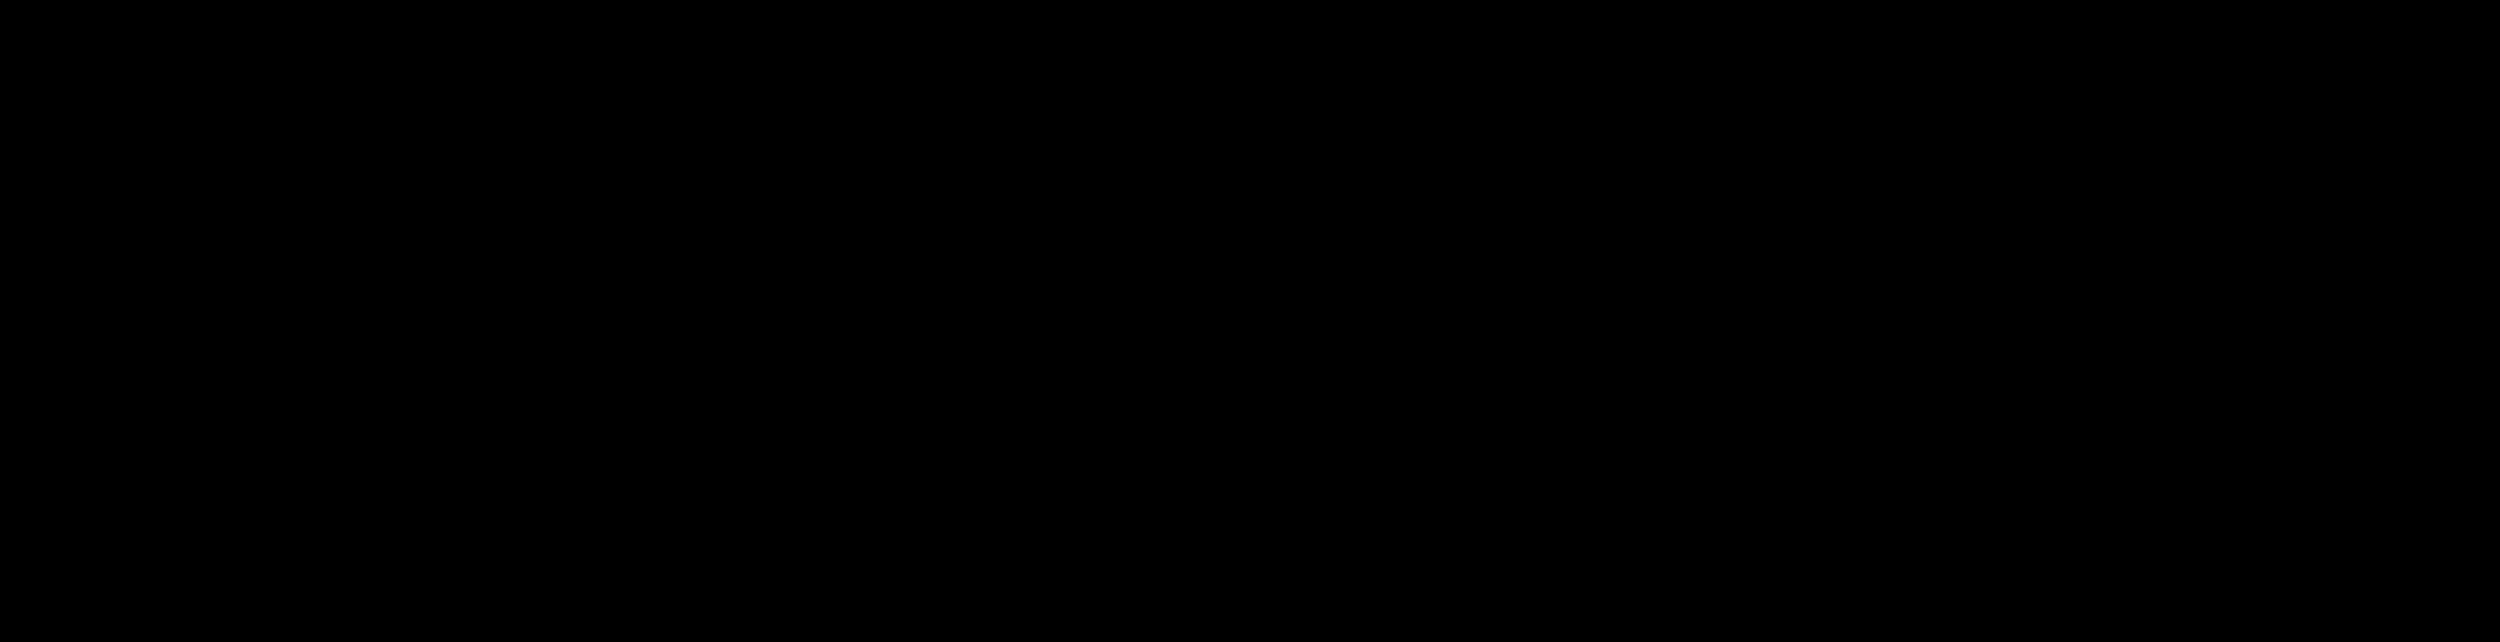 Logo Wings & name Black.png